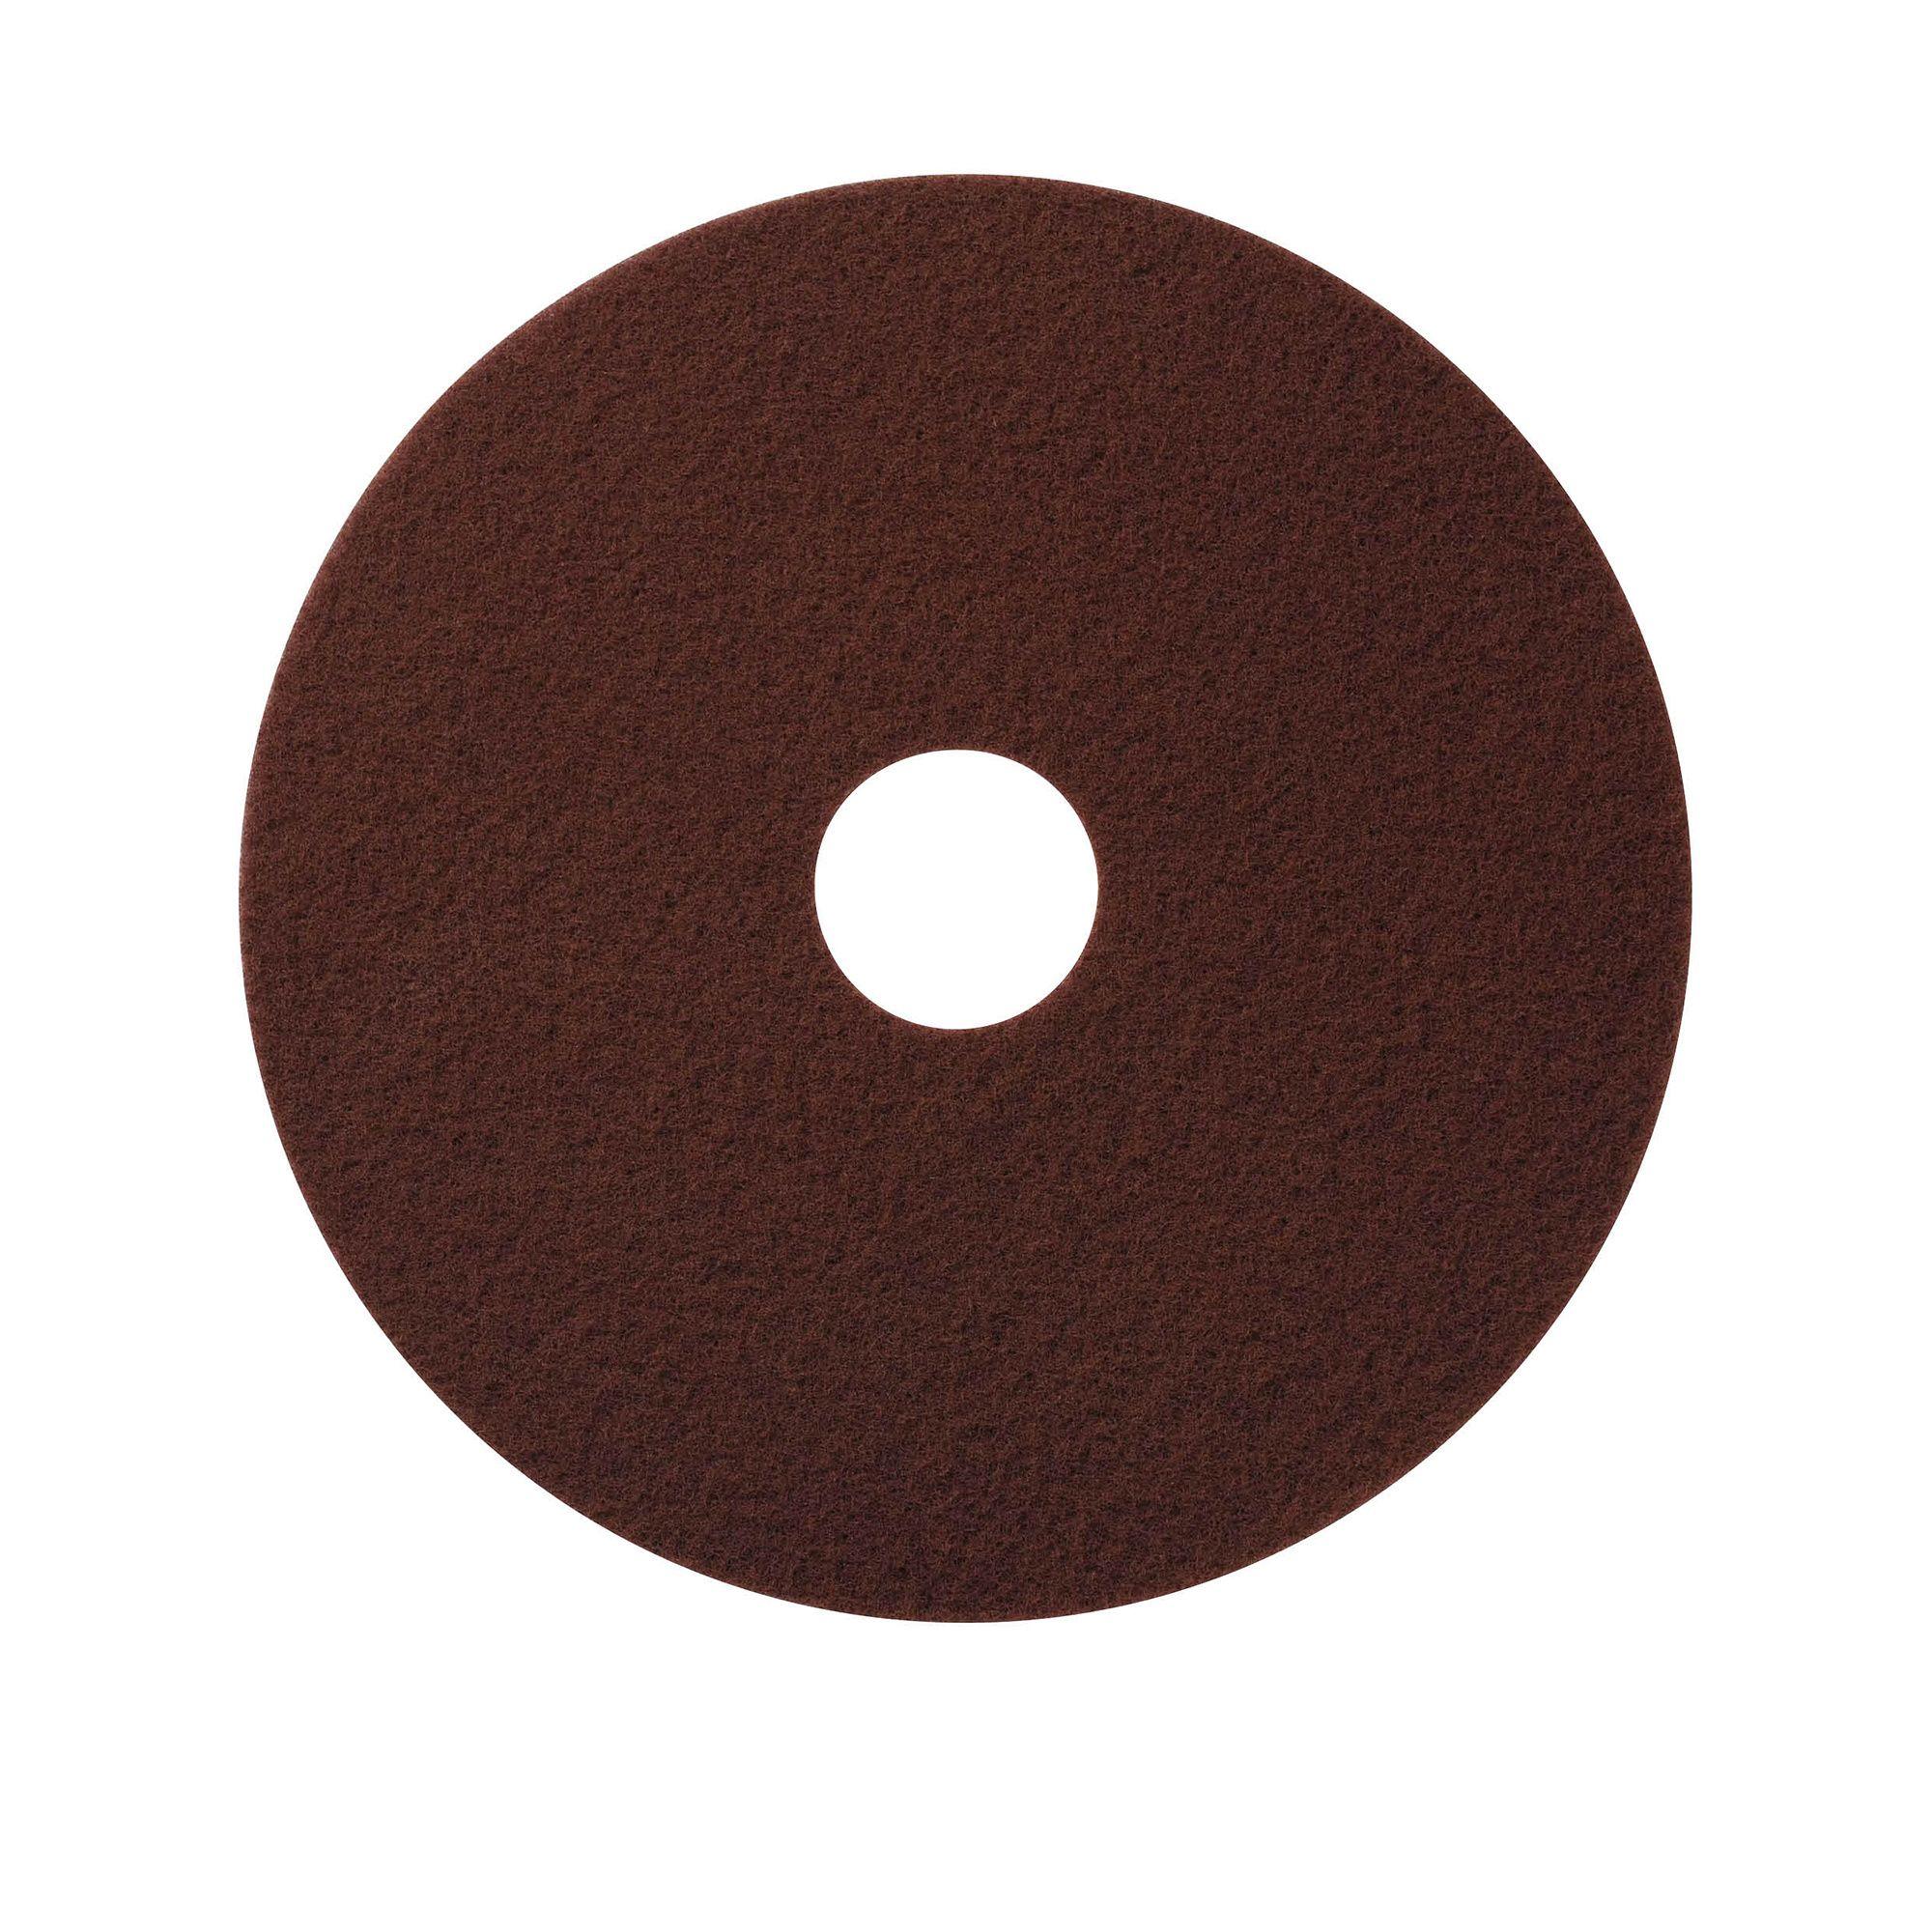 NuPad bruin (strippen zonder chemie), per 10 stuks, 16 inch / 406 mm